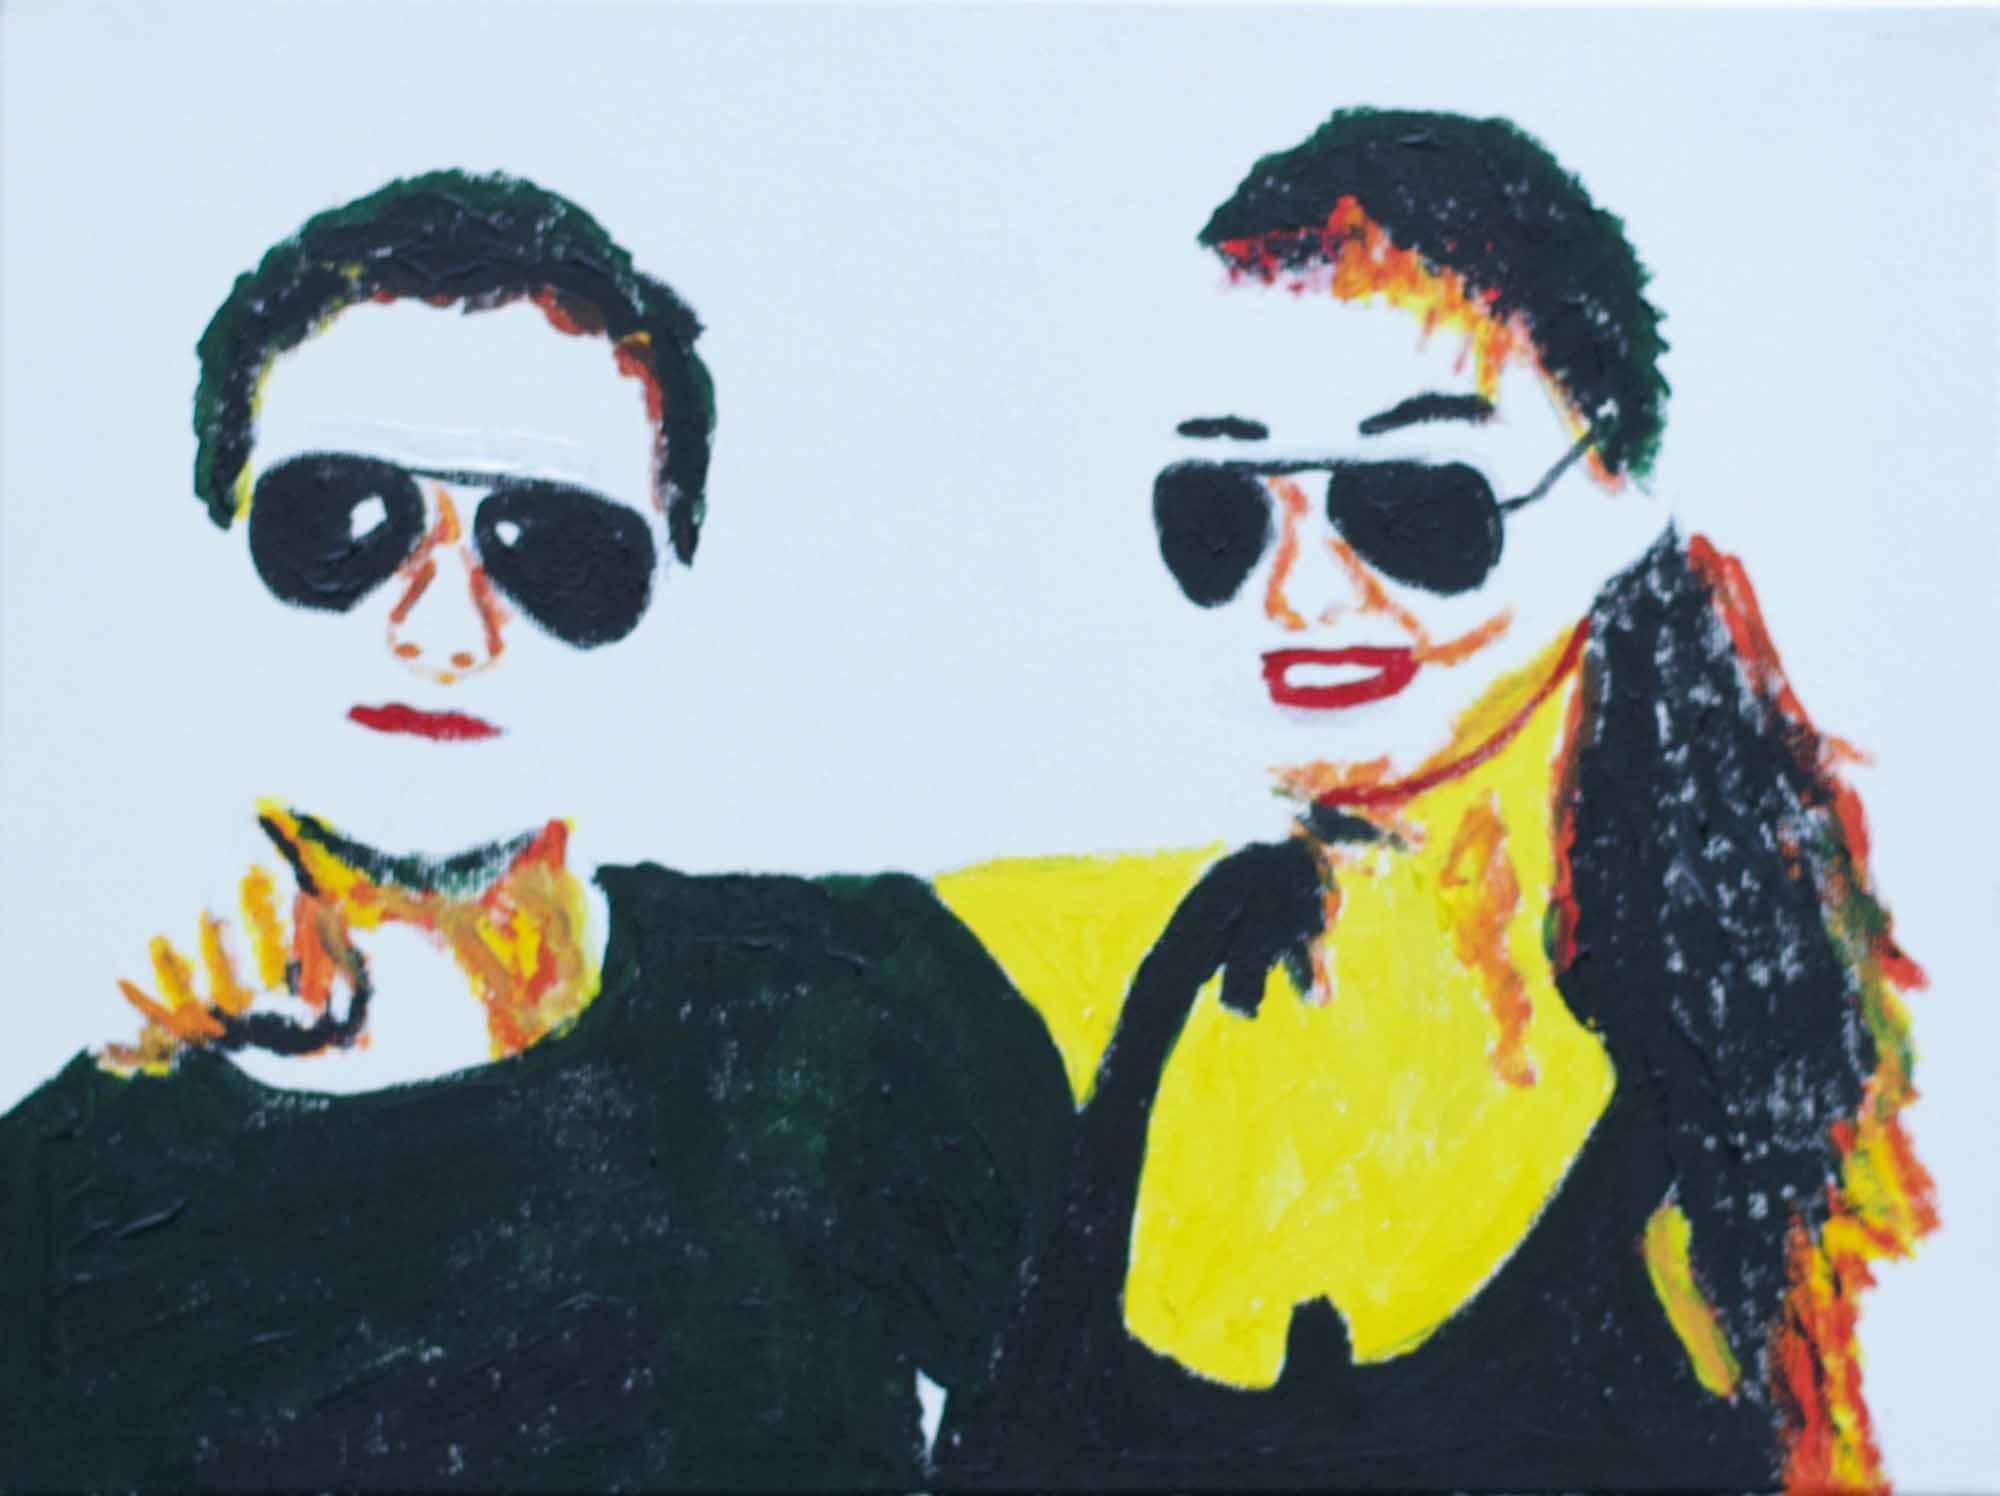 vriend en vriendin of broer en zus vereeuwigd in Andy Warhol Pop art stijl in rood, geel, wit en zwart